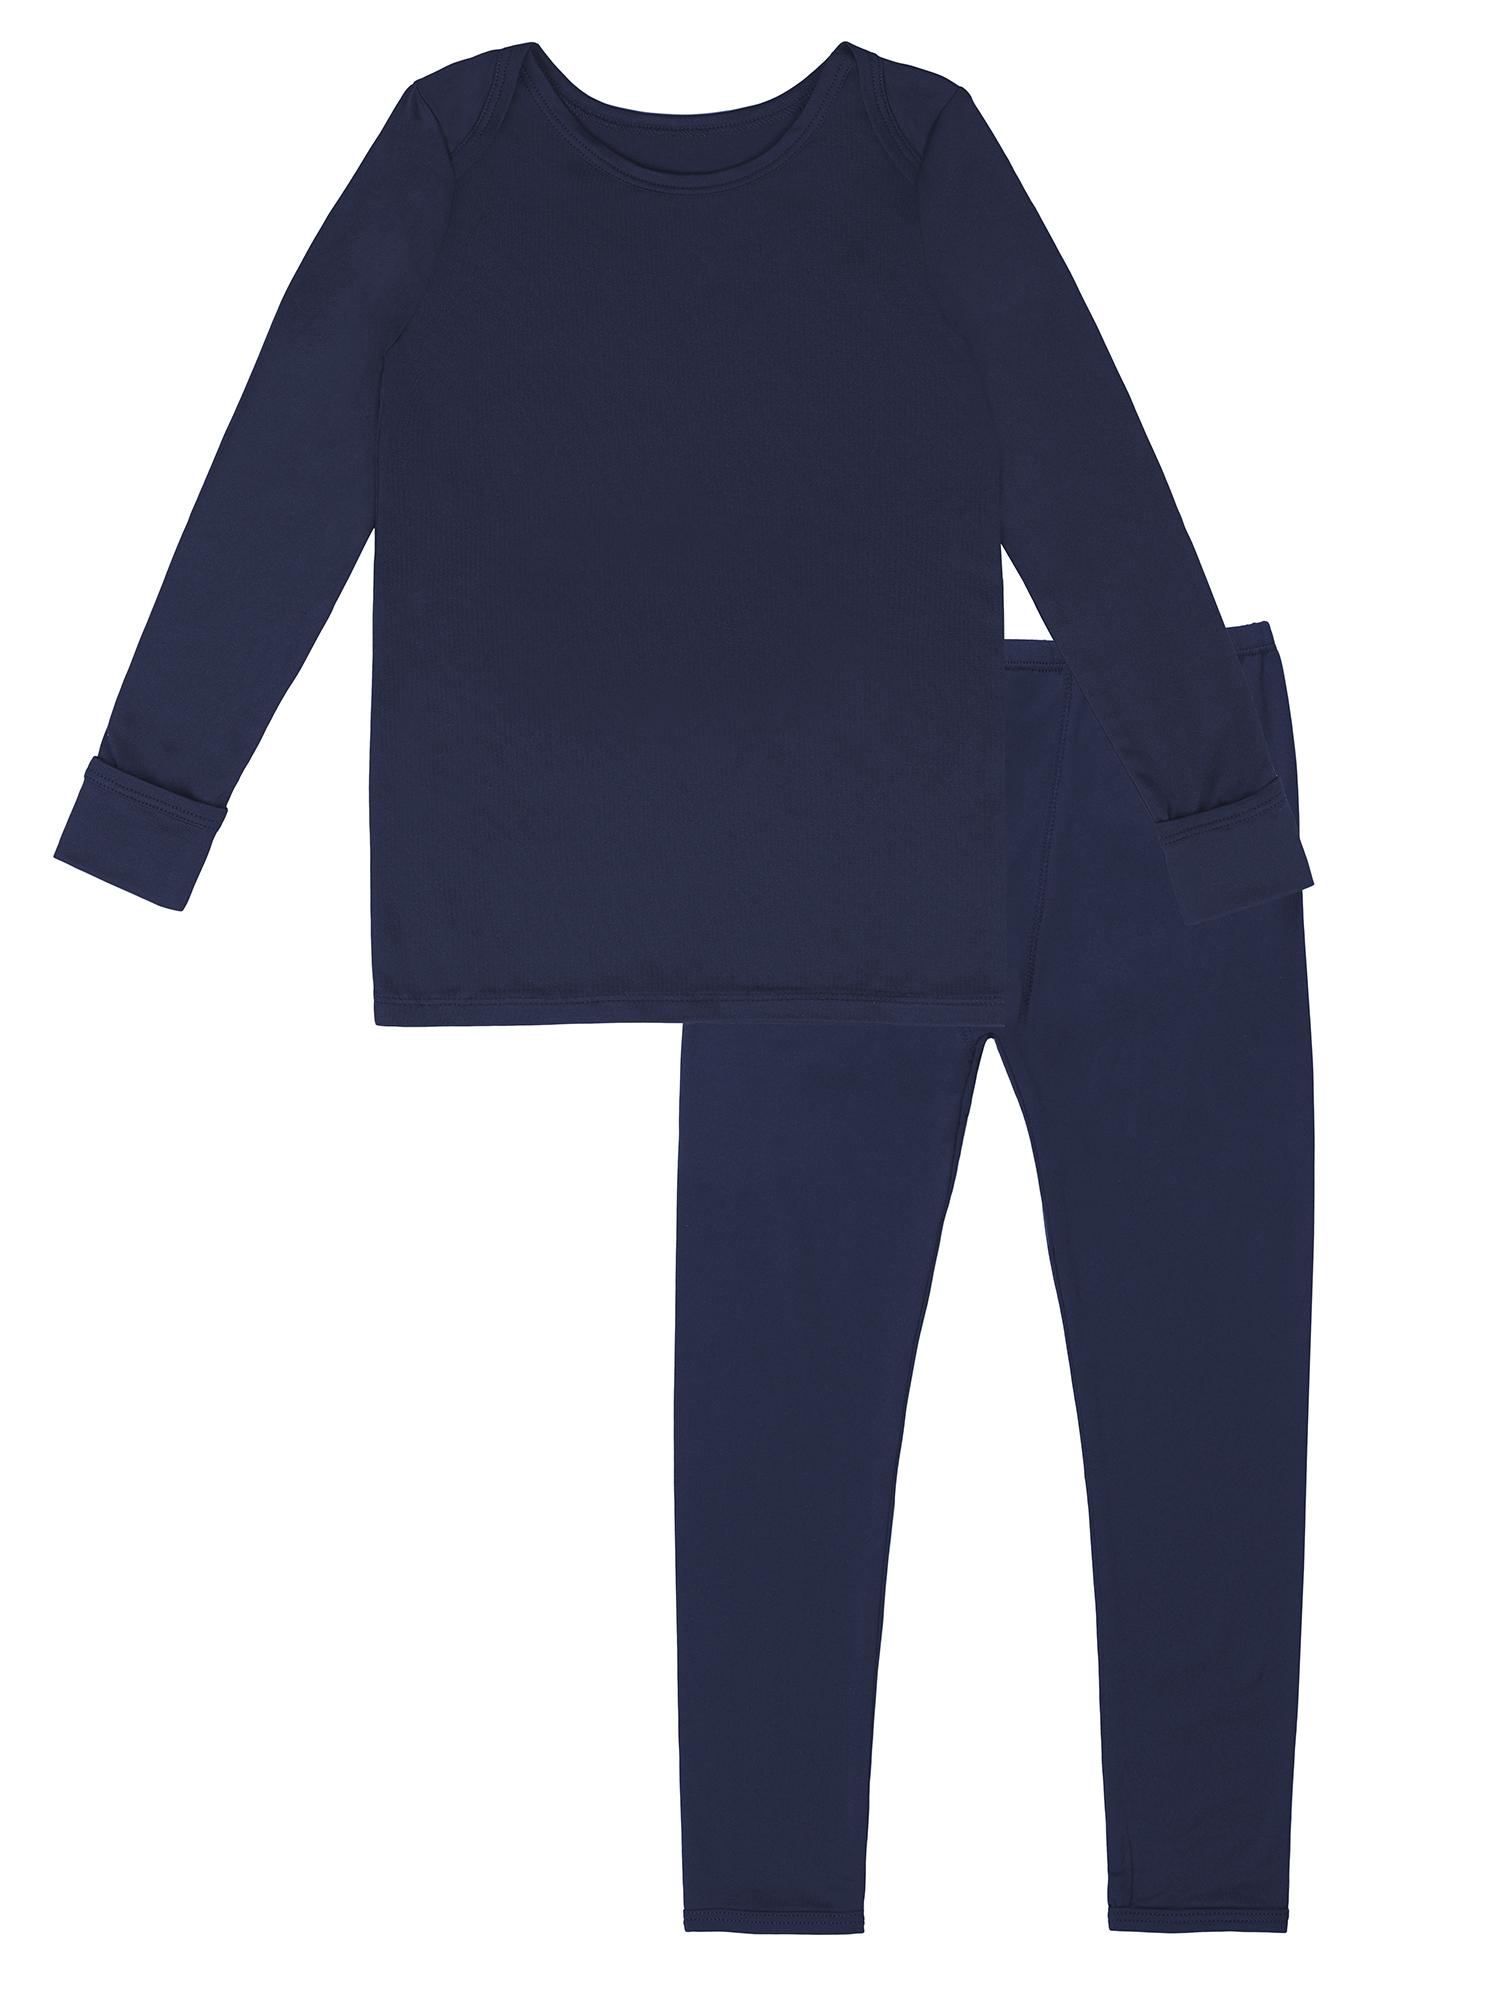 Polycore Warm Layering Long Underwear (Toddler Boys)